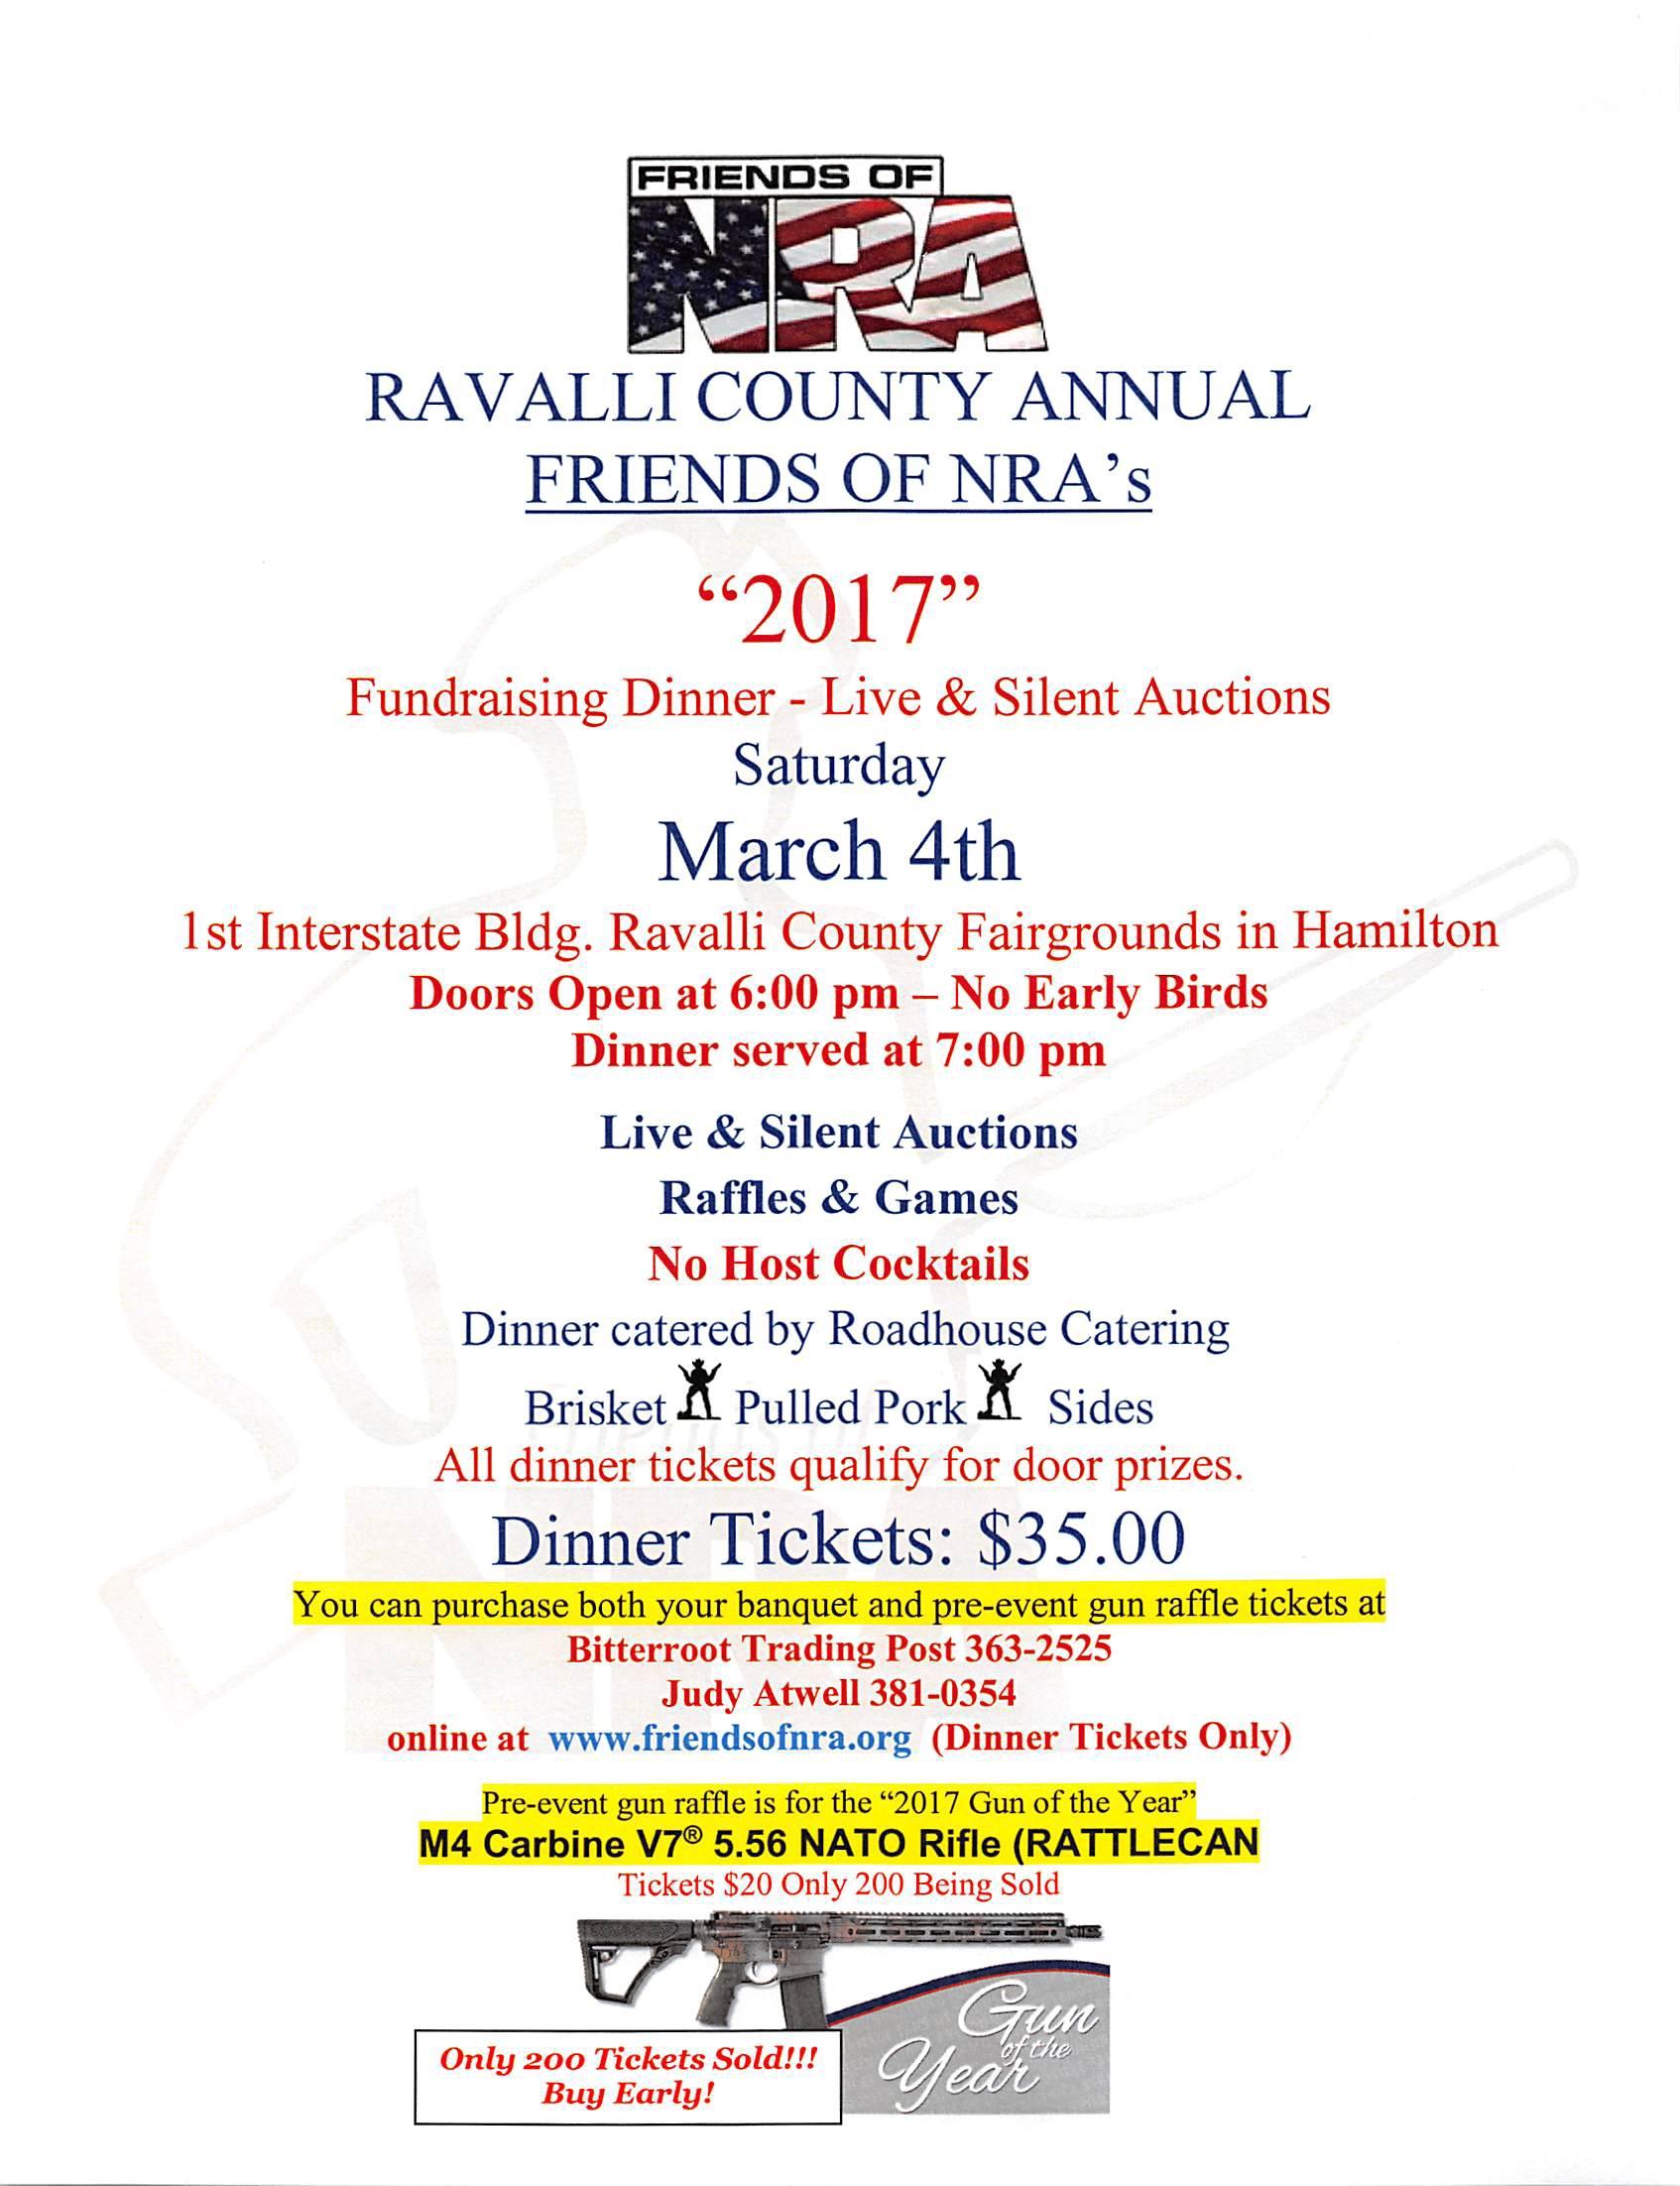 Ravalli County, MT - Official Website